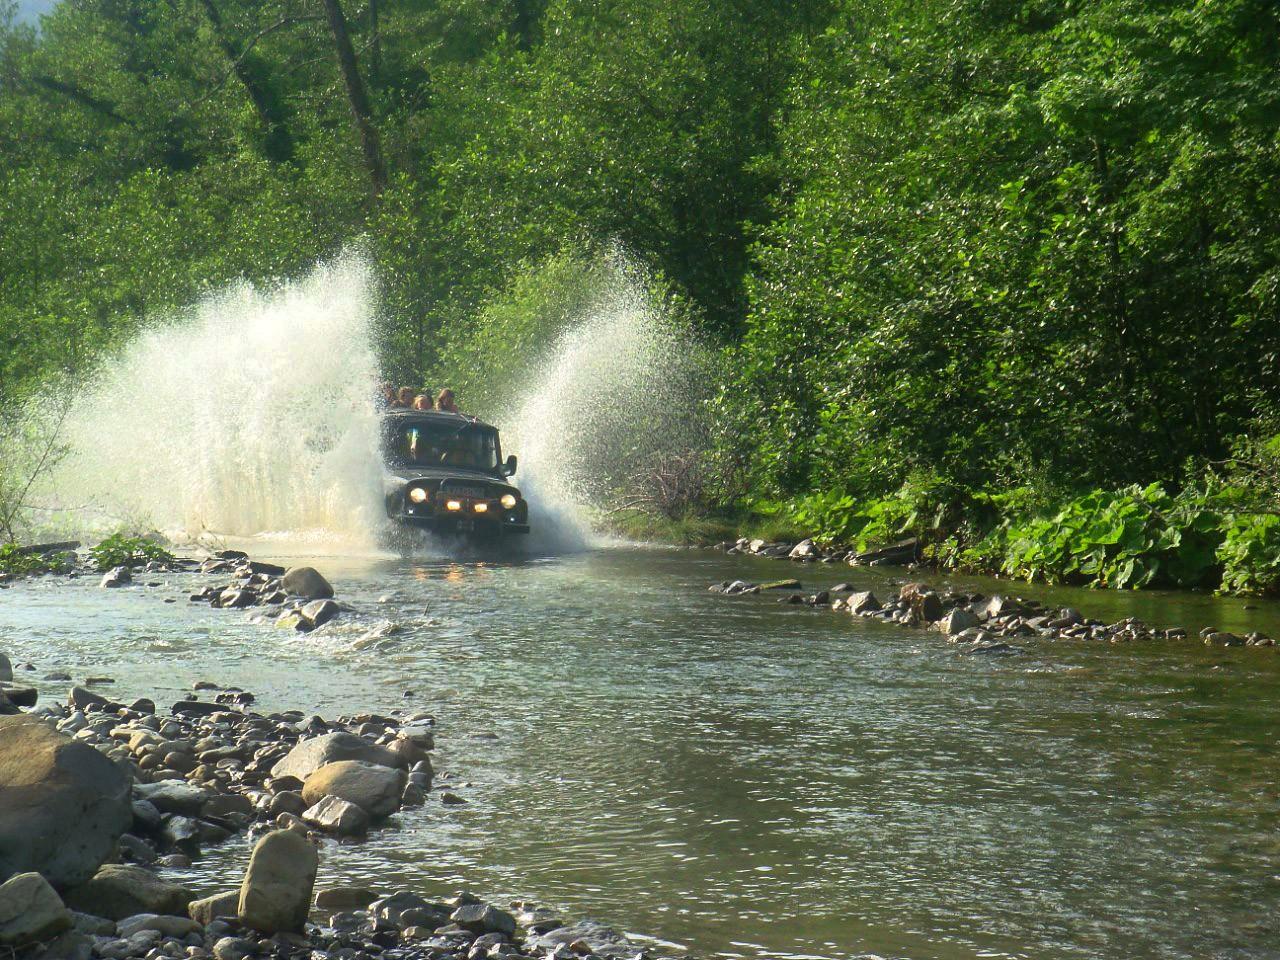 Фото: Джиппинг «Изумрудная долина реки Аше»